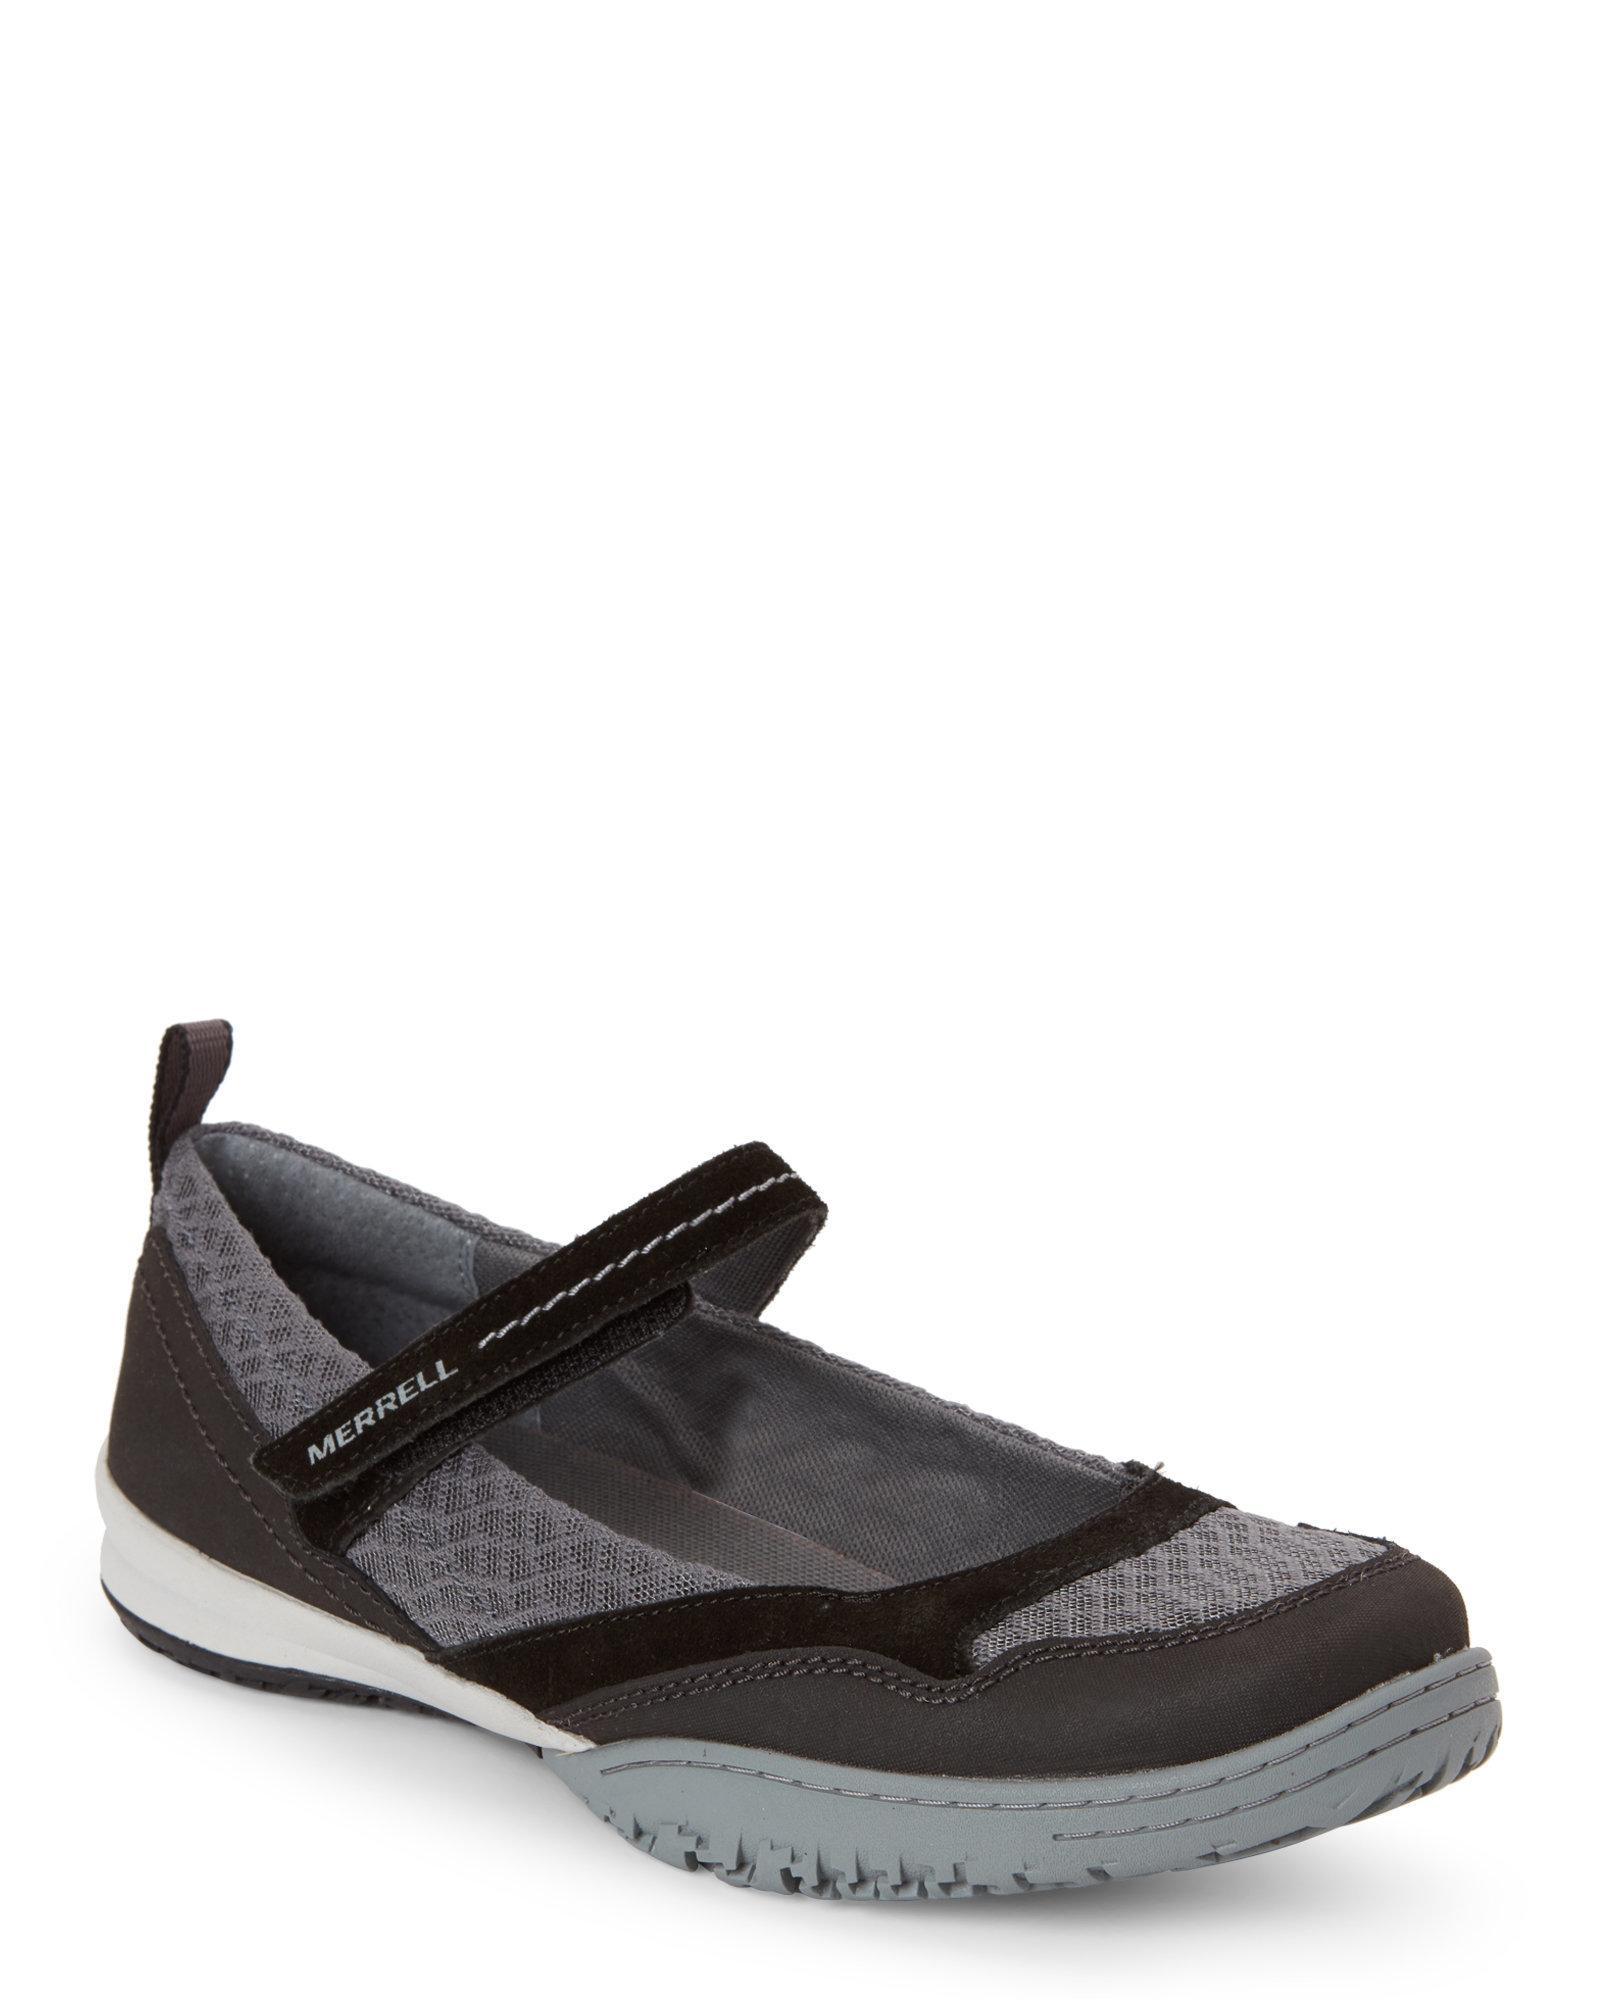 Women S Merrell Albany Mary Jane Shoes